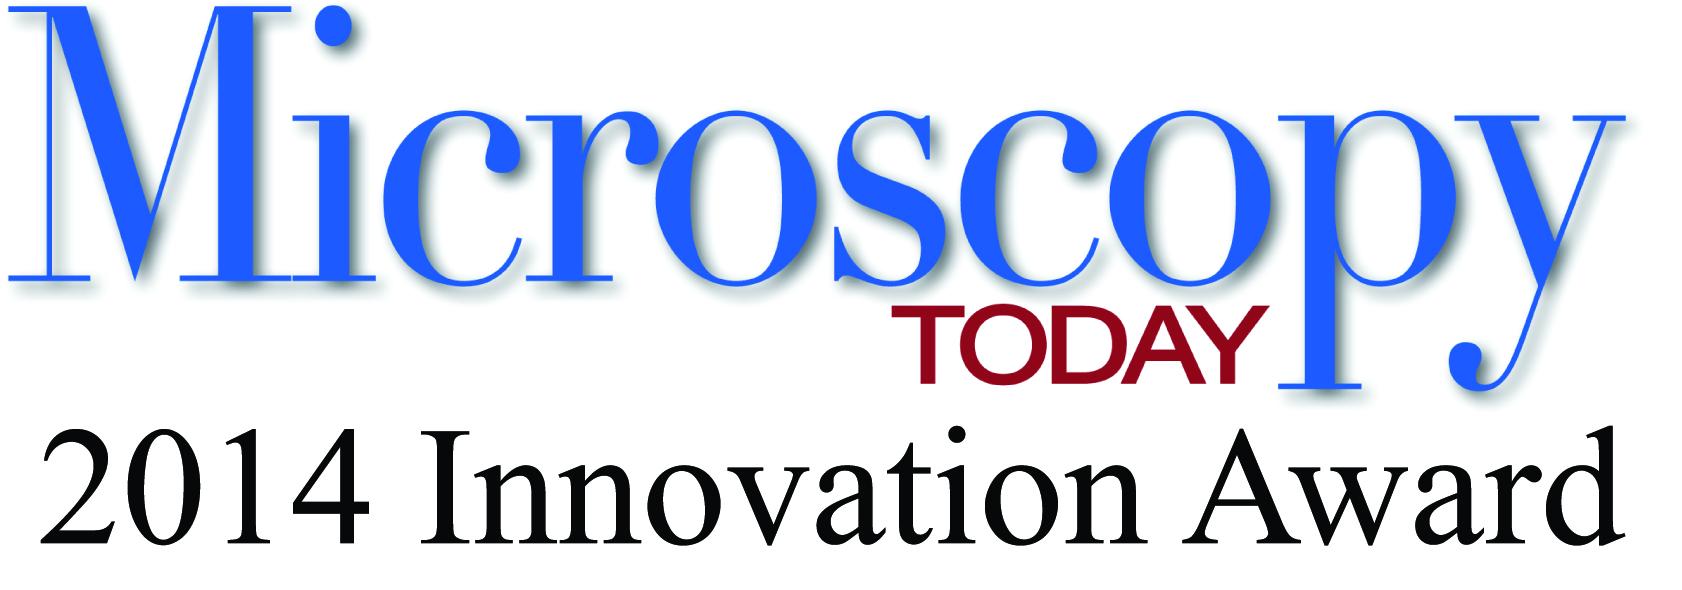 Microscopy today 2014 Awards Image